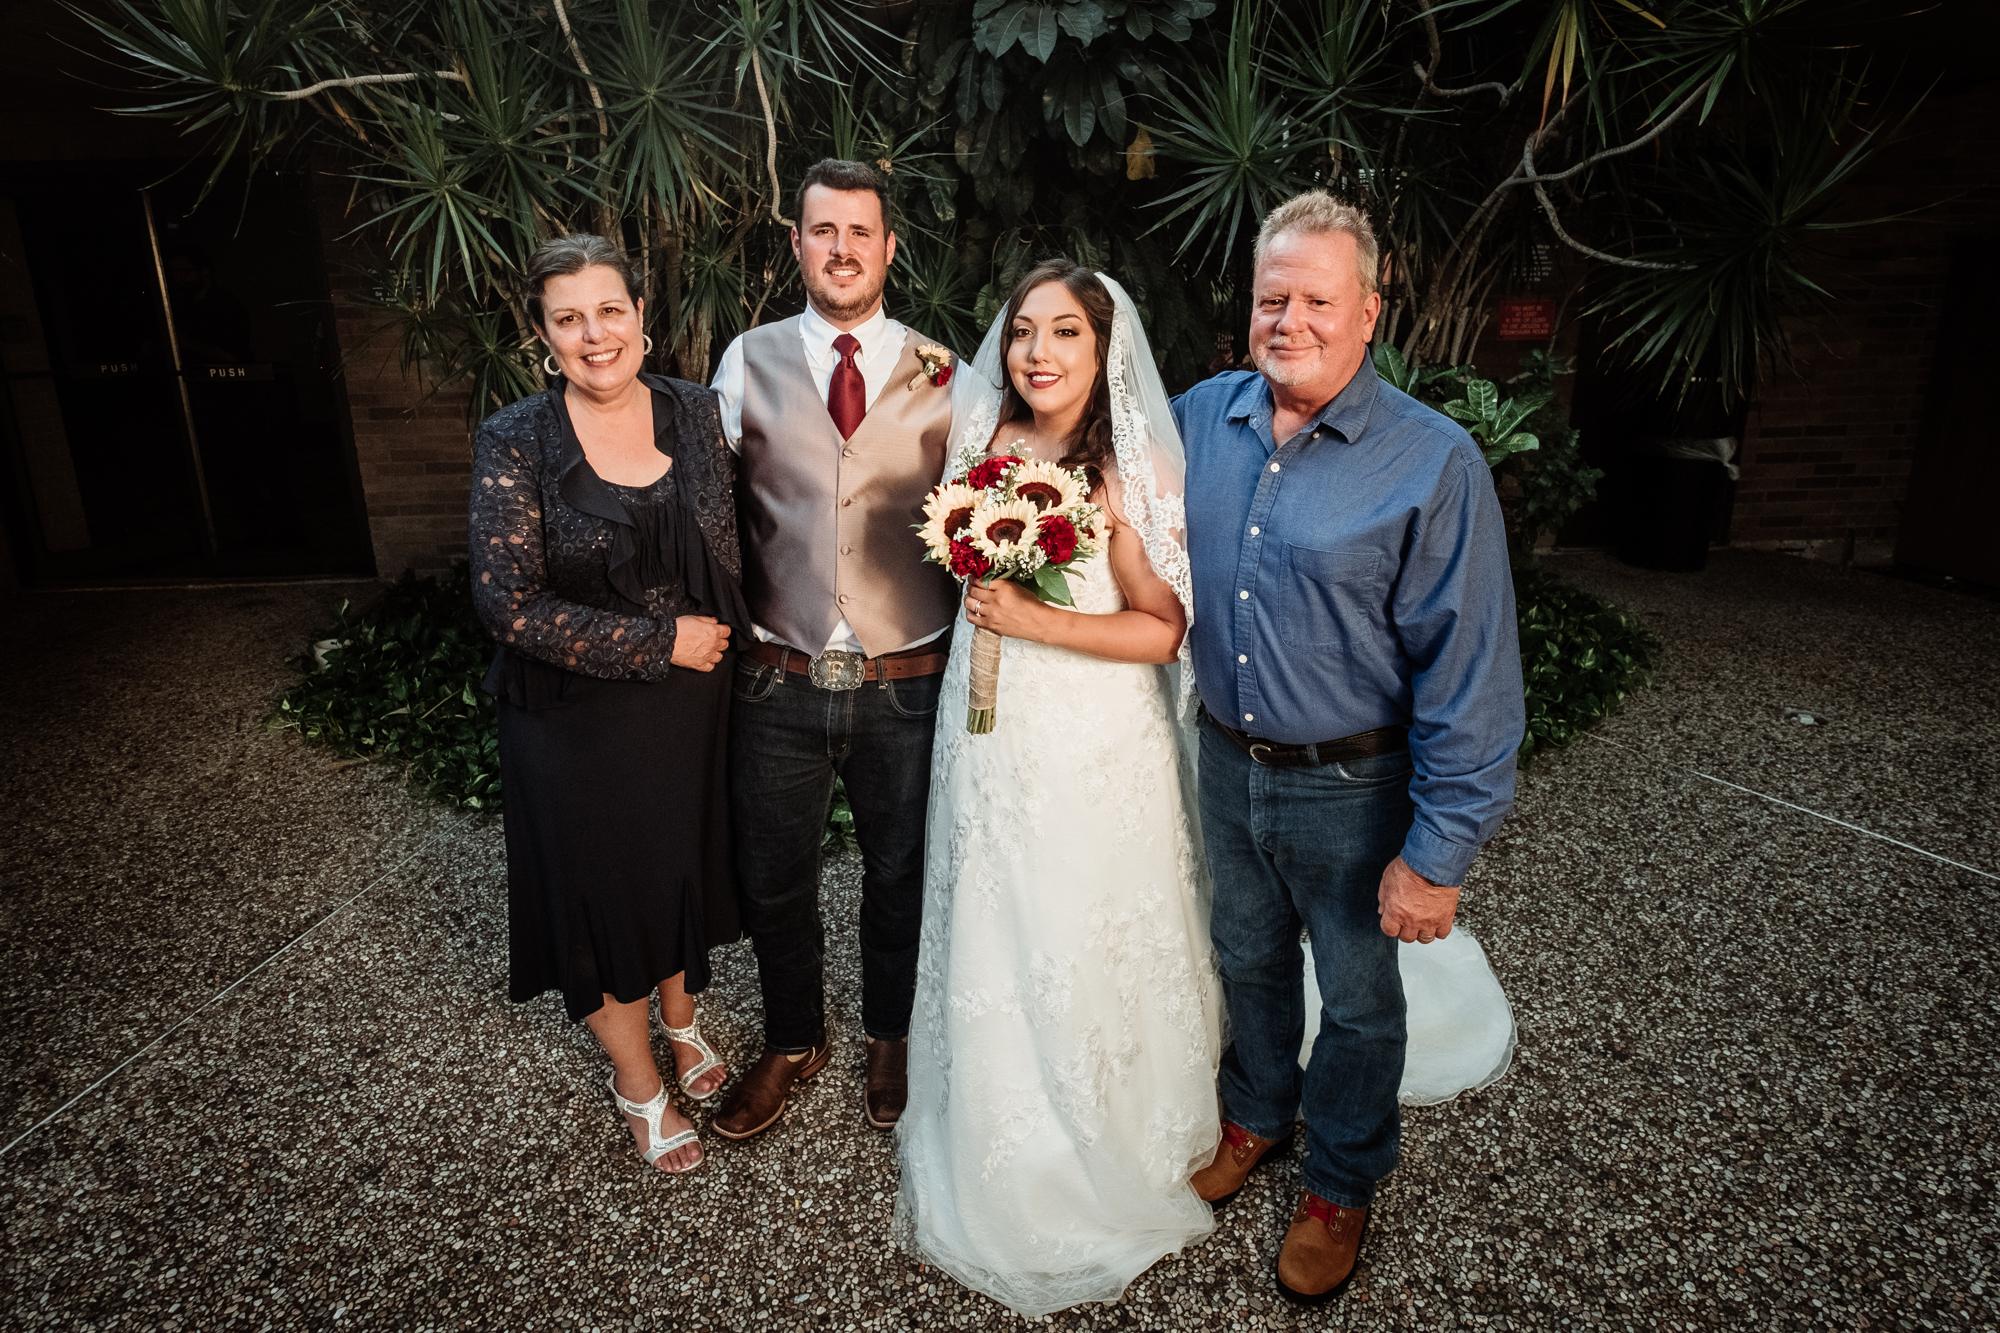 DallasAlyssa-Wedding-2019-JF-1127.jpg